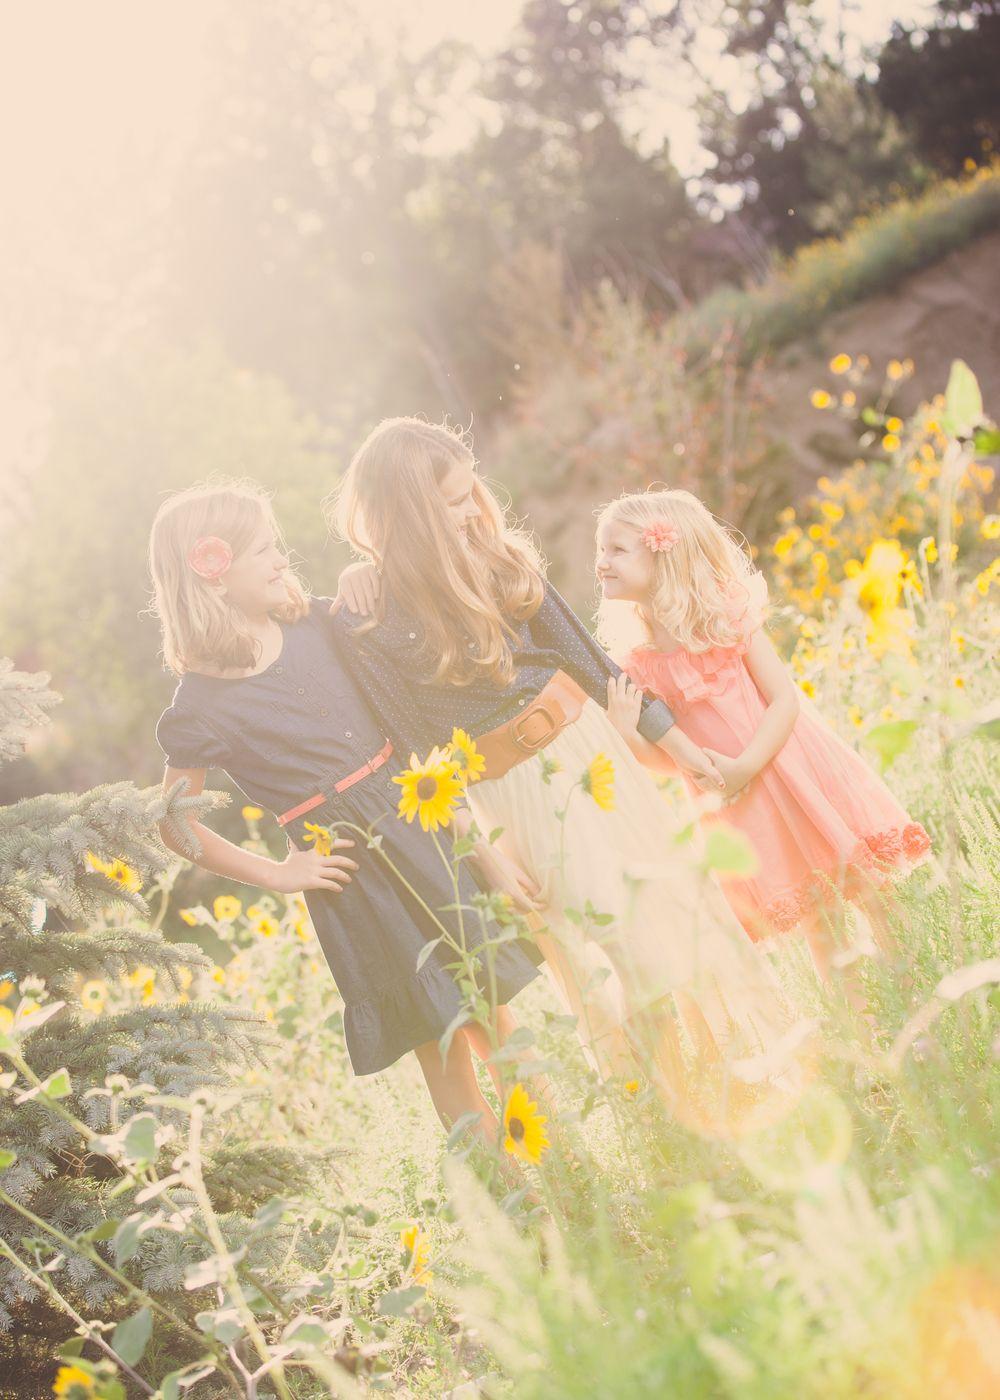 sunflower fields 3> #maylilyphoto #photography #children